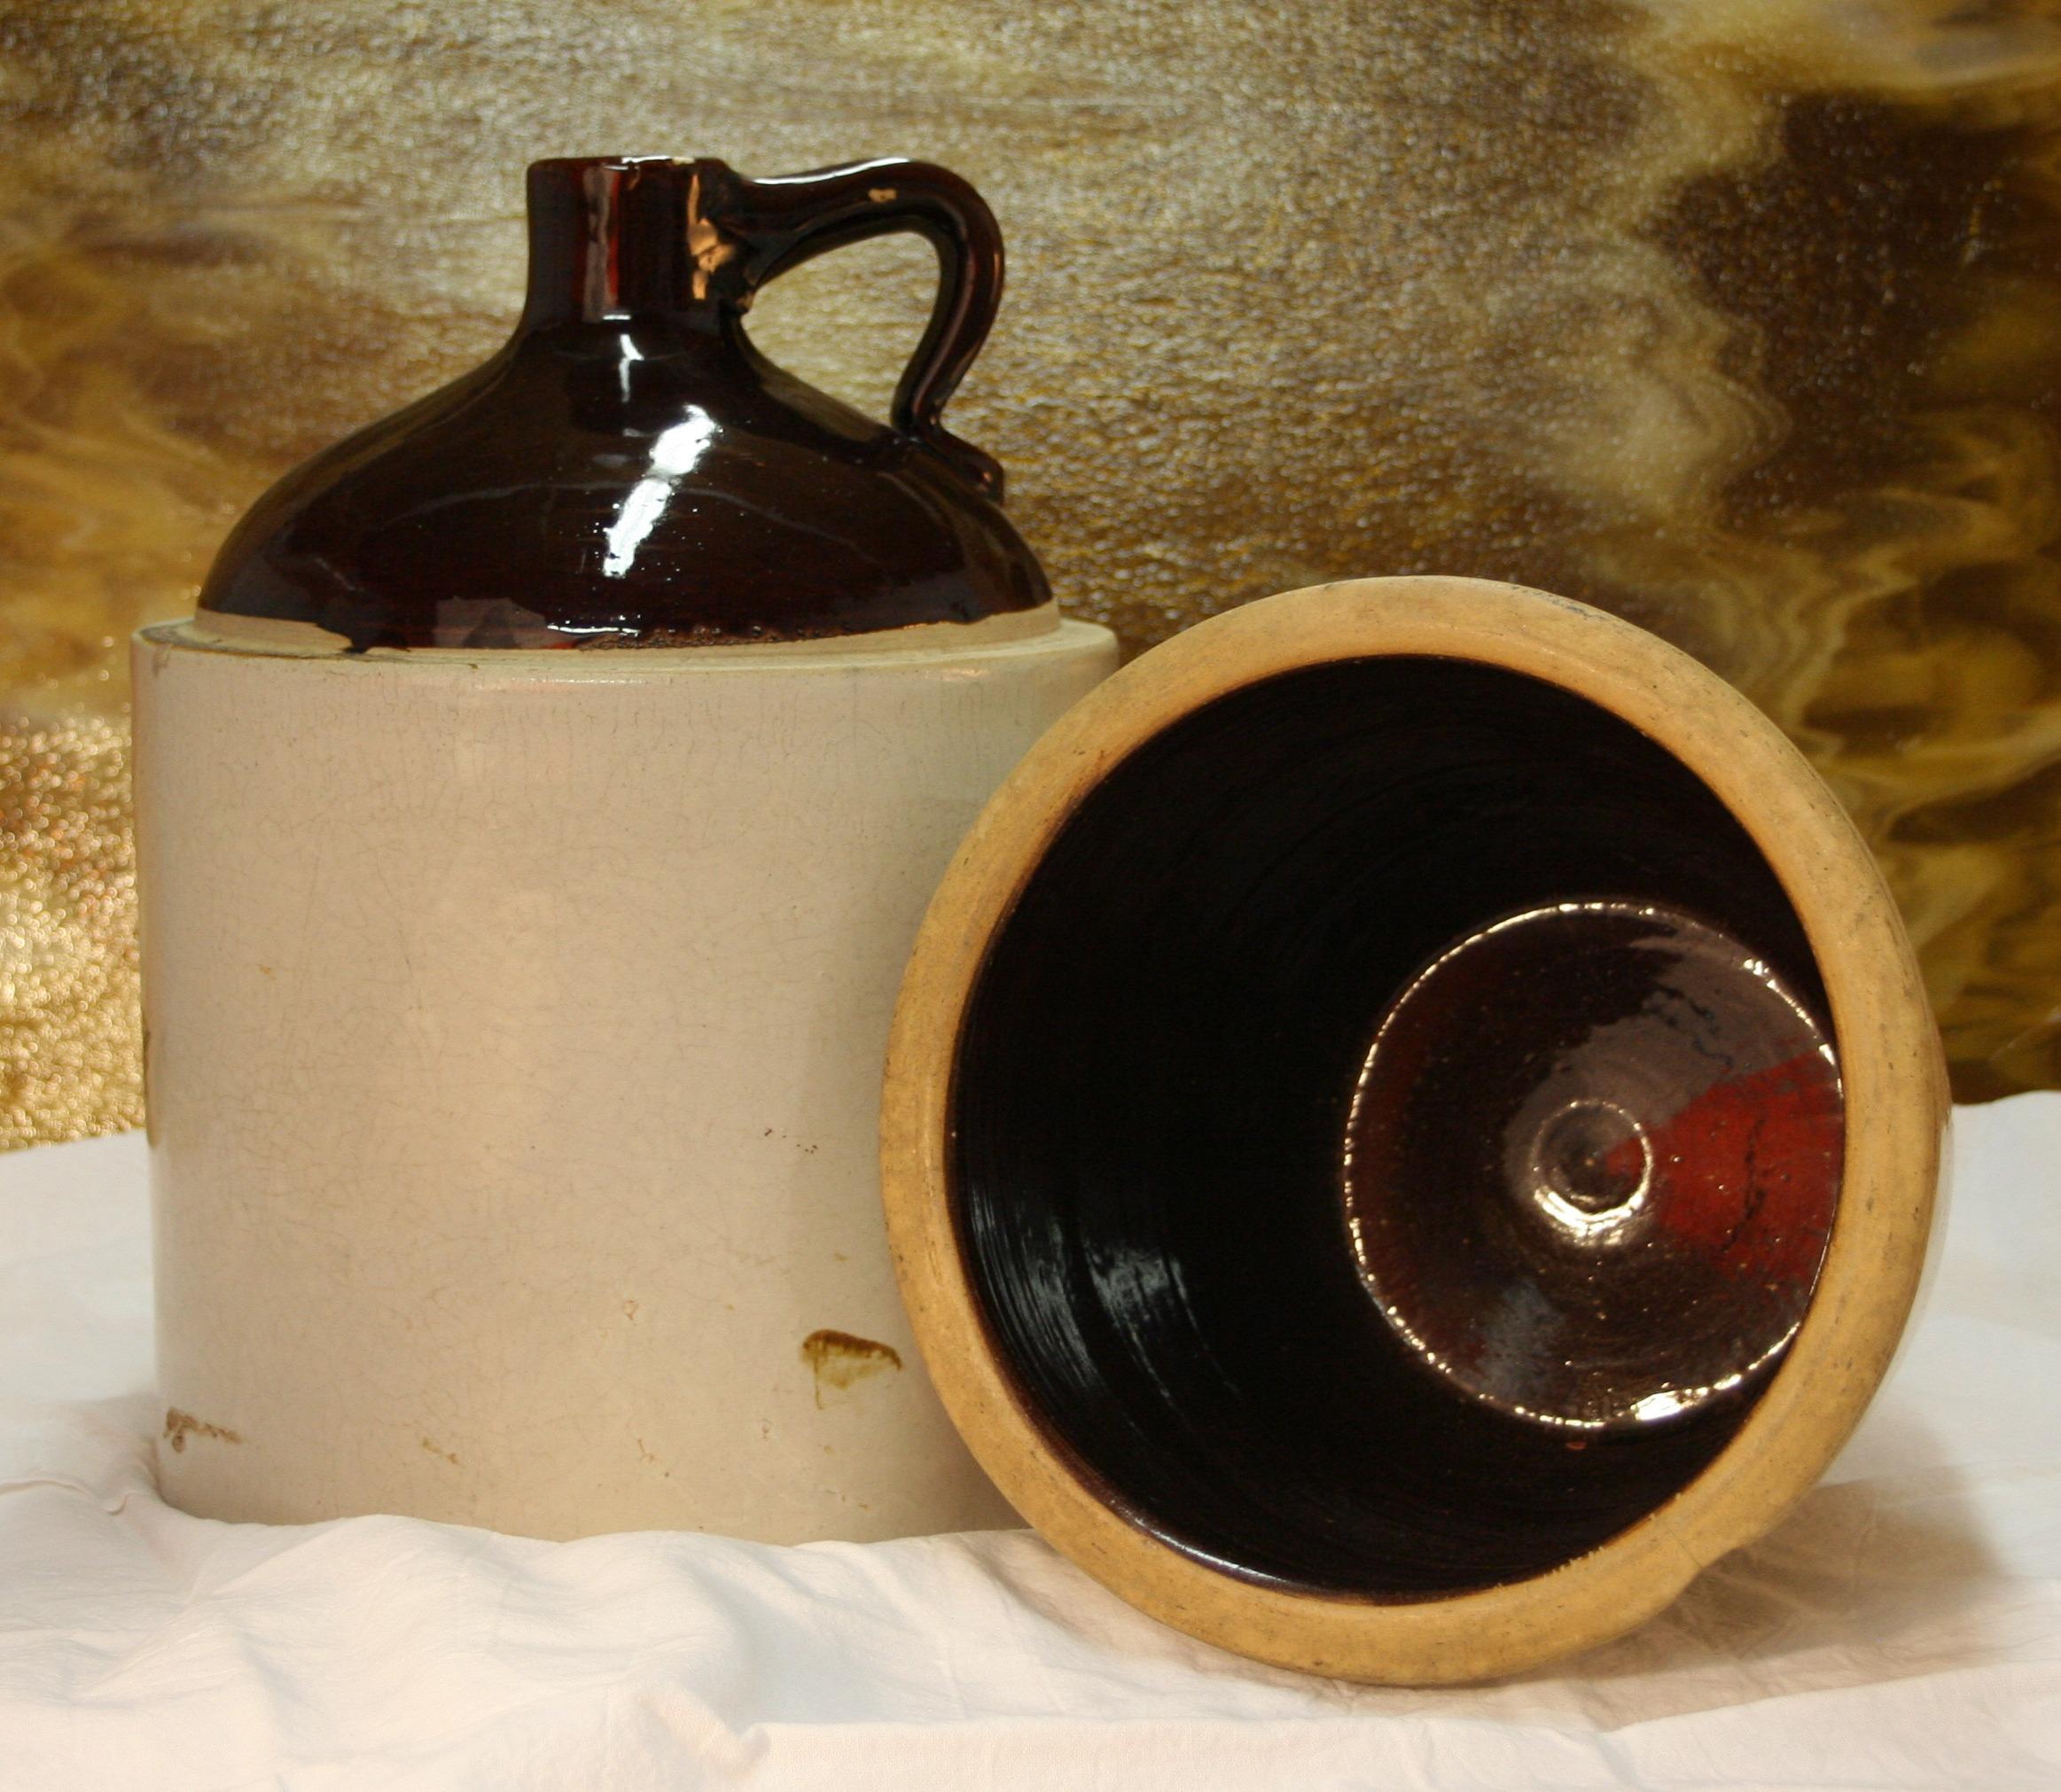 Kostenlose Foto : Jahrgang, Retro, Pot, Rustikal, Glas, Tasse, Ausrüstung,  Keramik, Kessel, Mais, Küche, Getränk, Flasche, Leer, Geschirr, Alkohol, ...